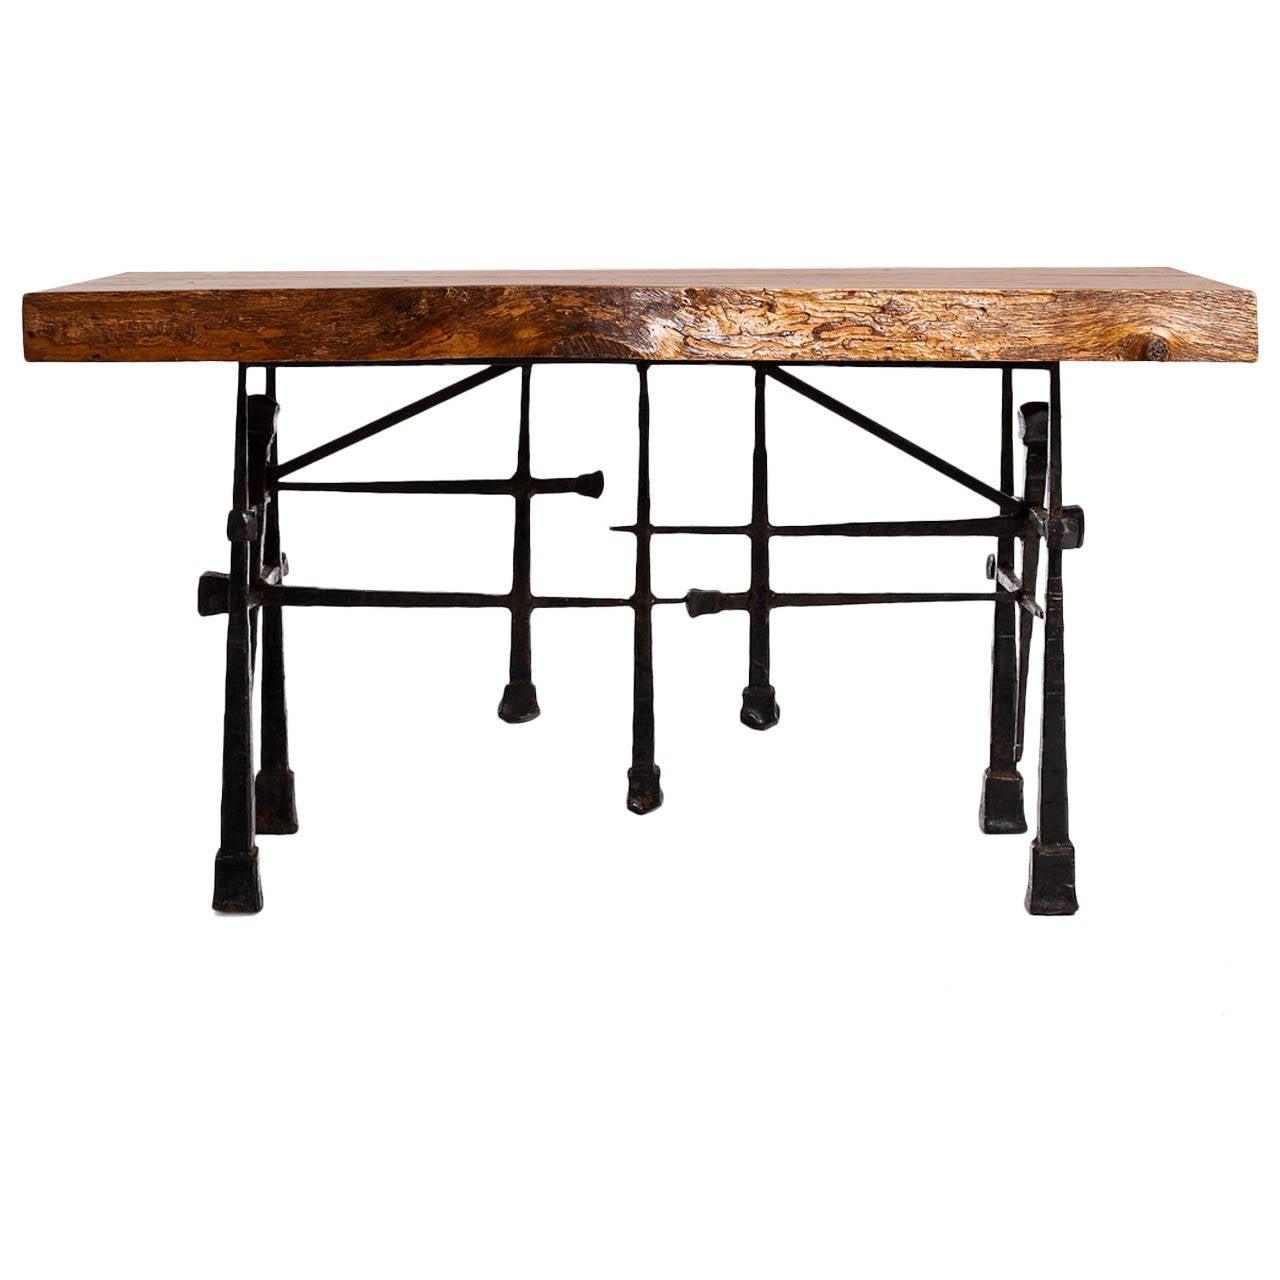 Paul Evans Brutalist side table, 1950s